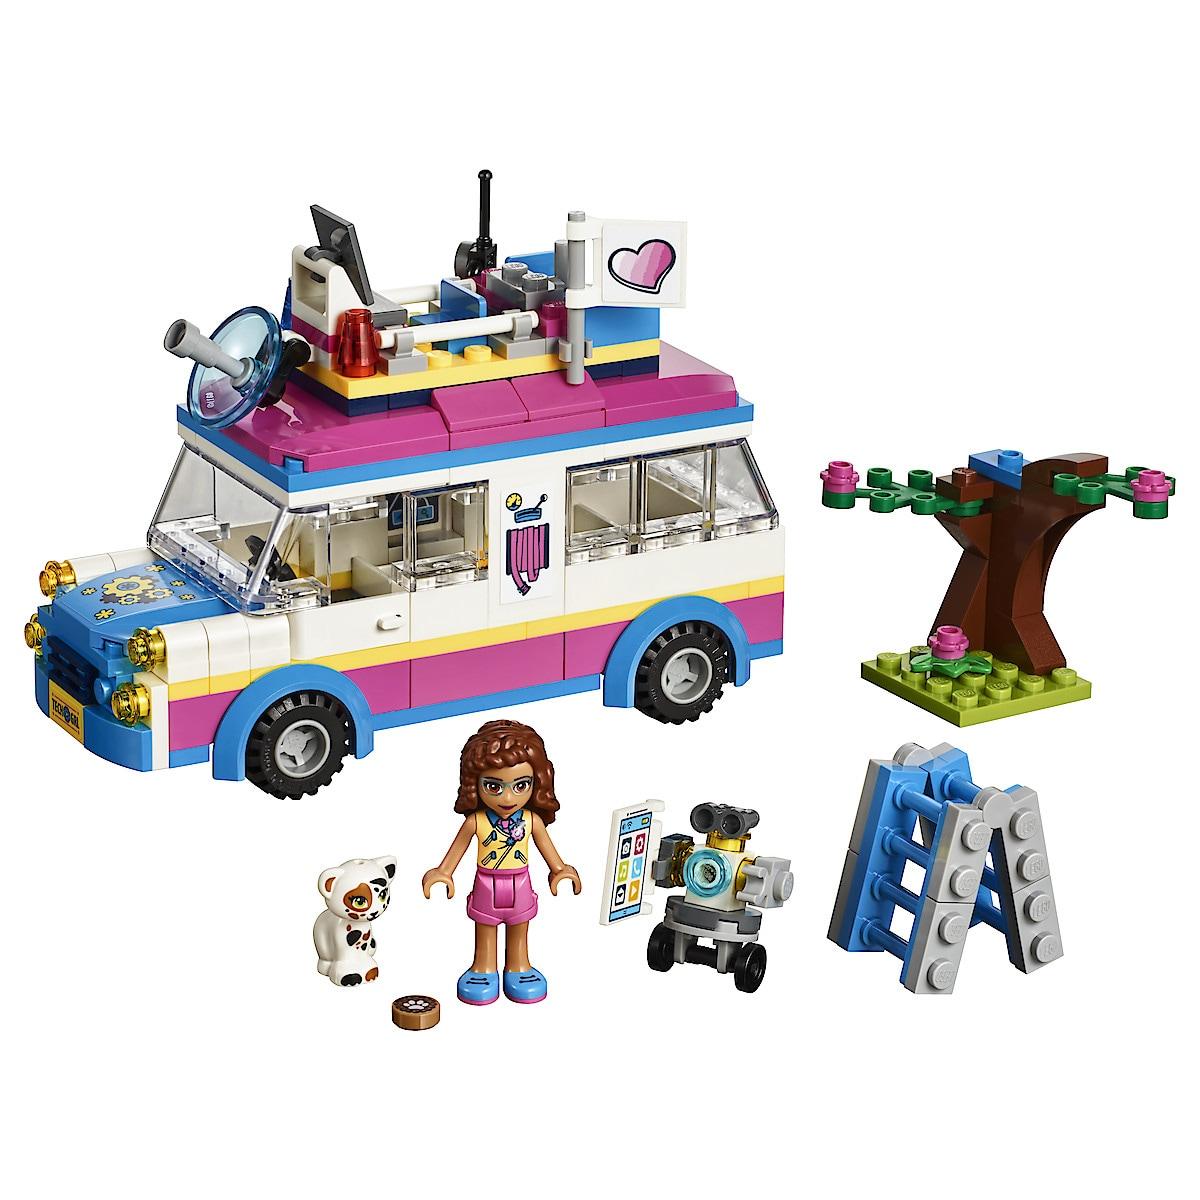 LEGO Friends 41333, Olivias uppdragsfordon